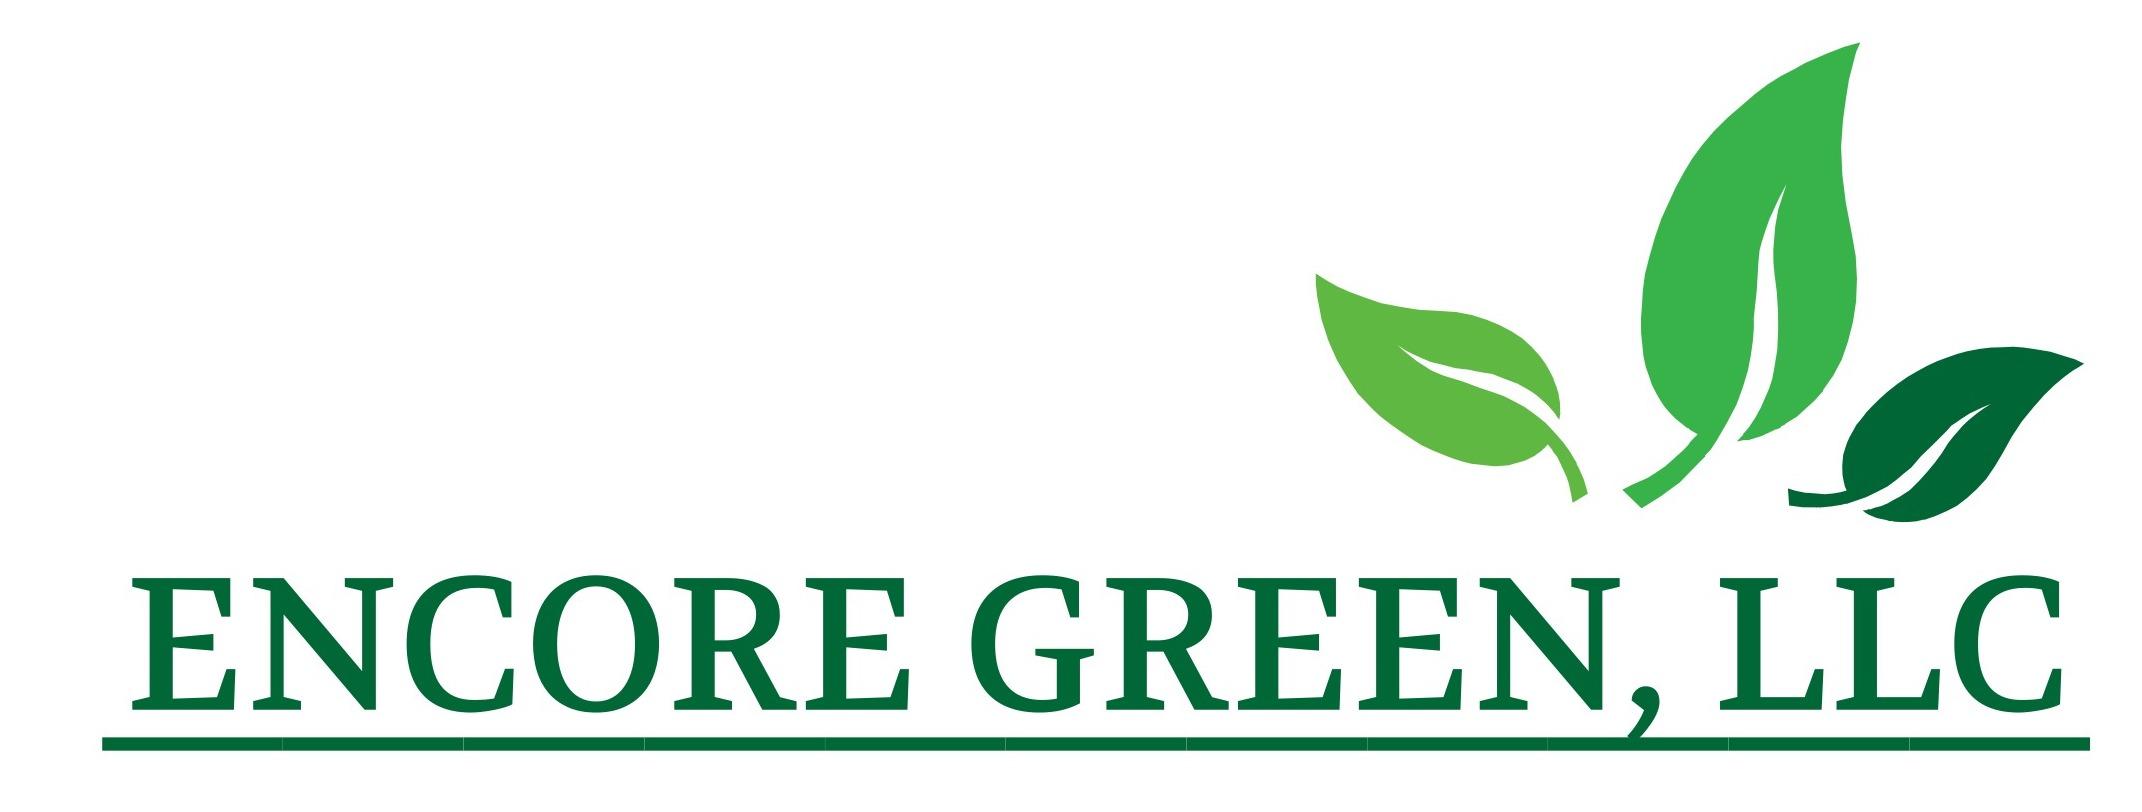 Encore Green, LLC